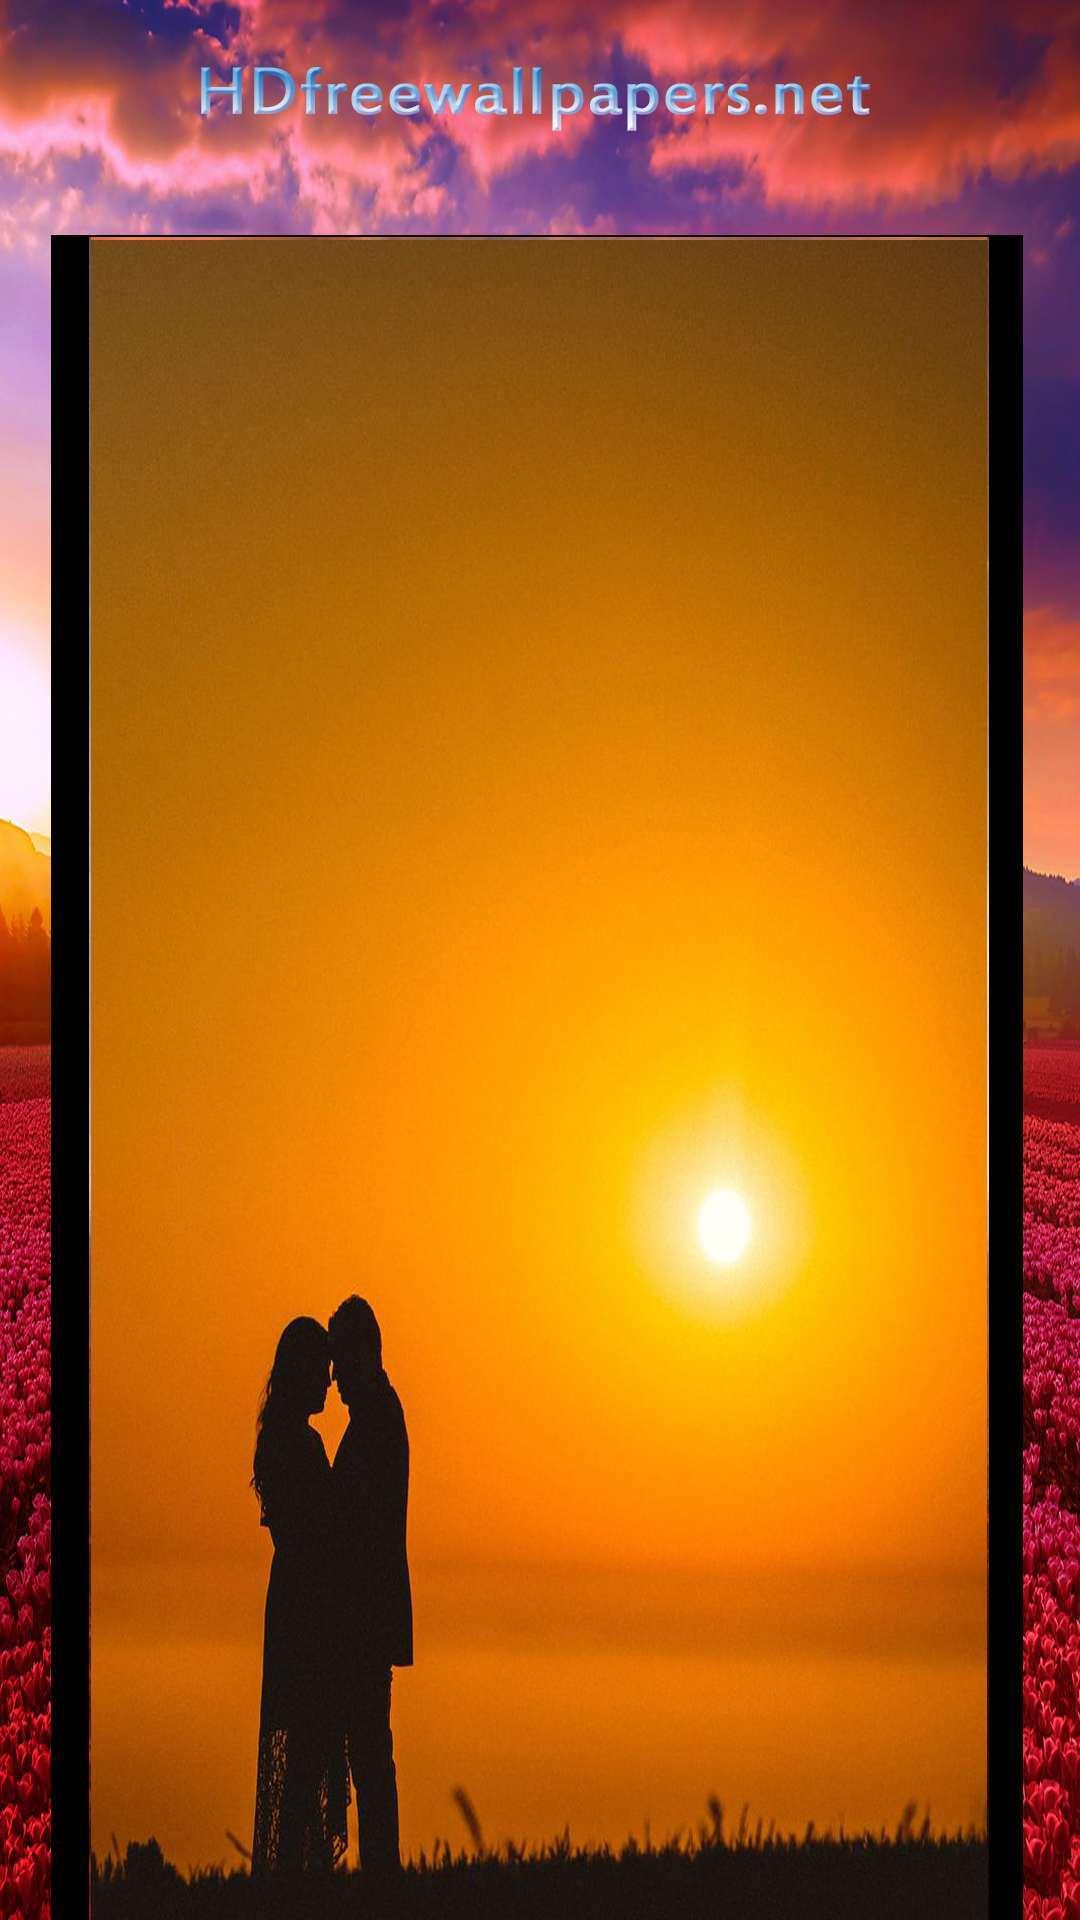 Love Hd Wallpaper For Mobile 1080 - HD Wallpaper